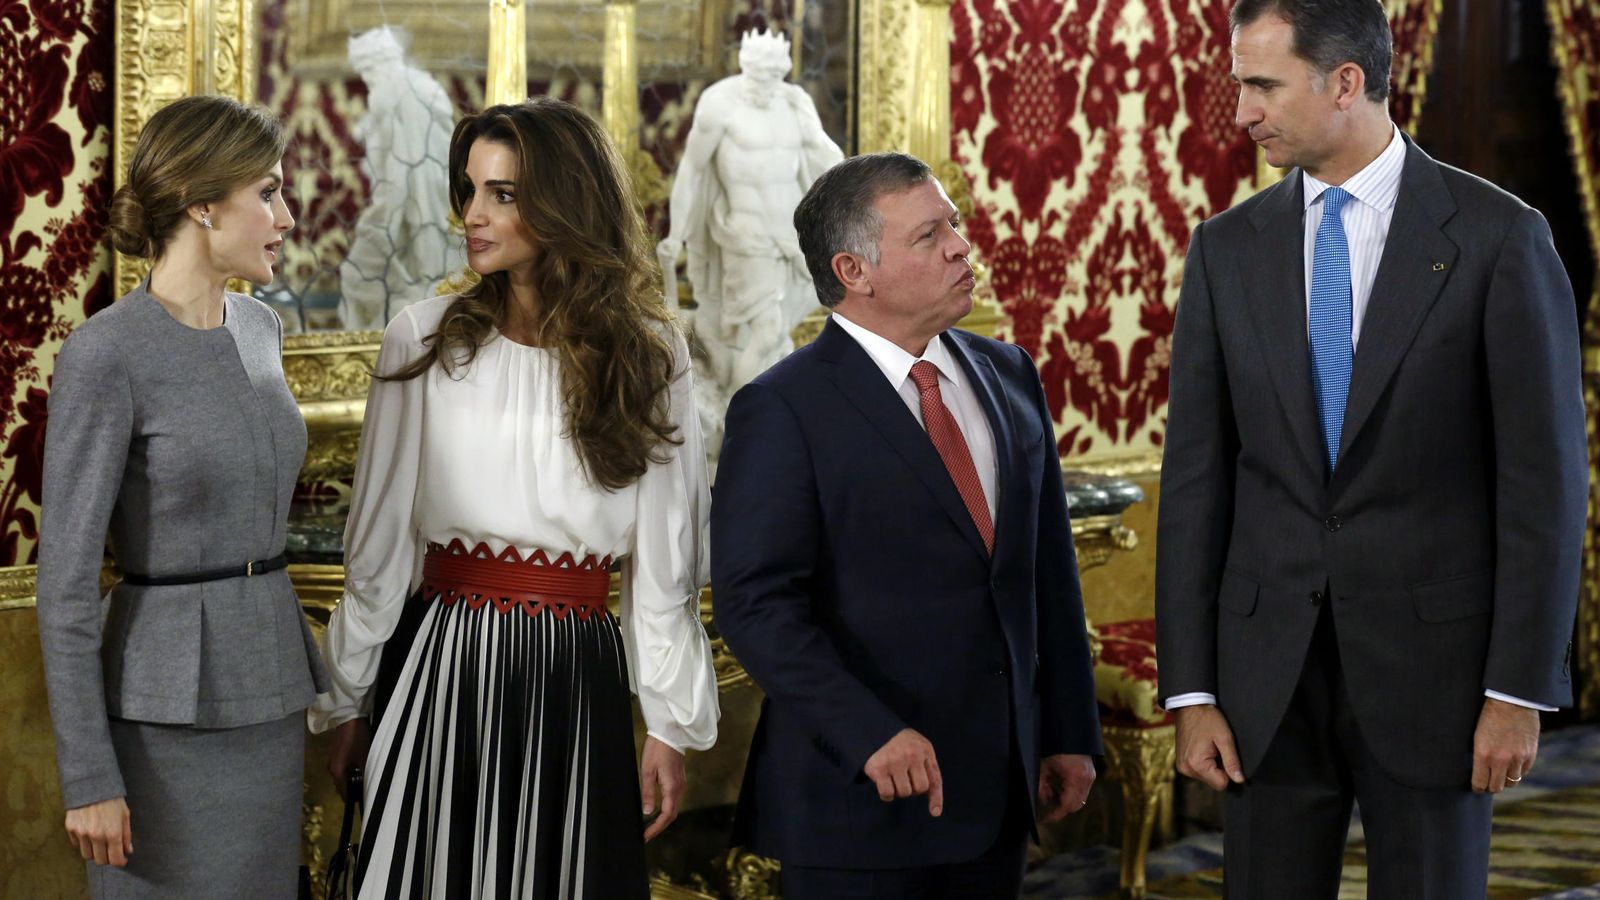 Familia real espa ola la visita de los reyes de jordania a espa a en im genes fotogaler as de - Casas de famosos en espana ...